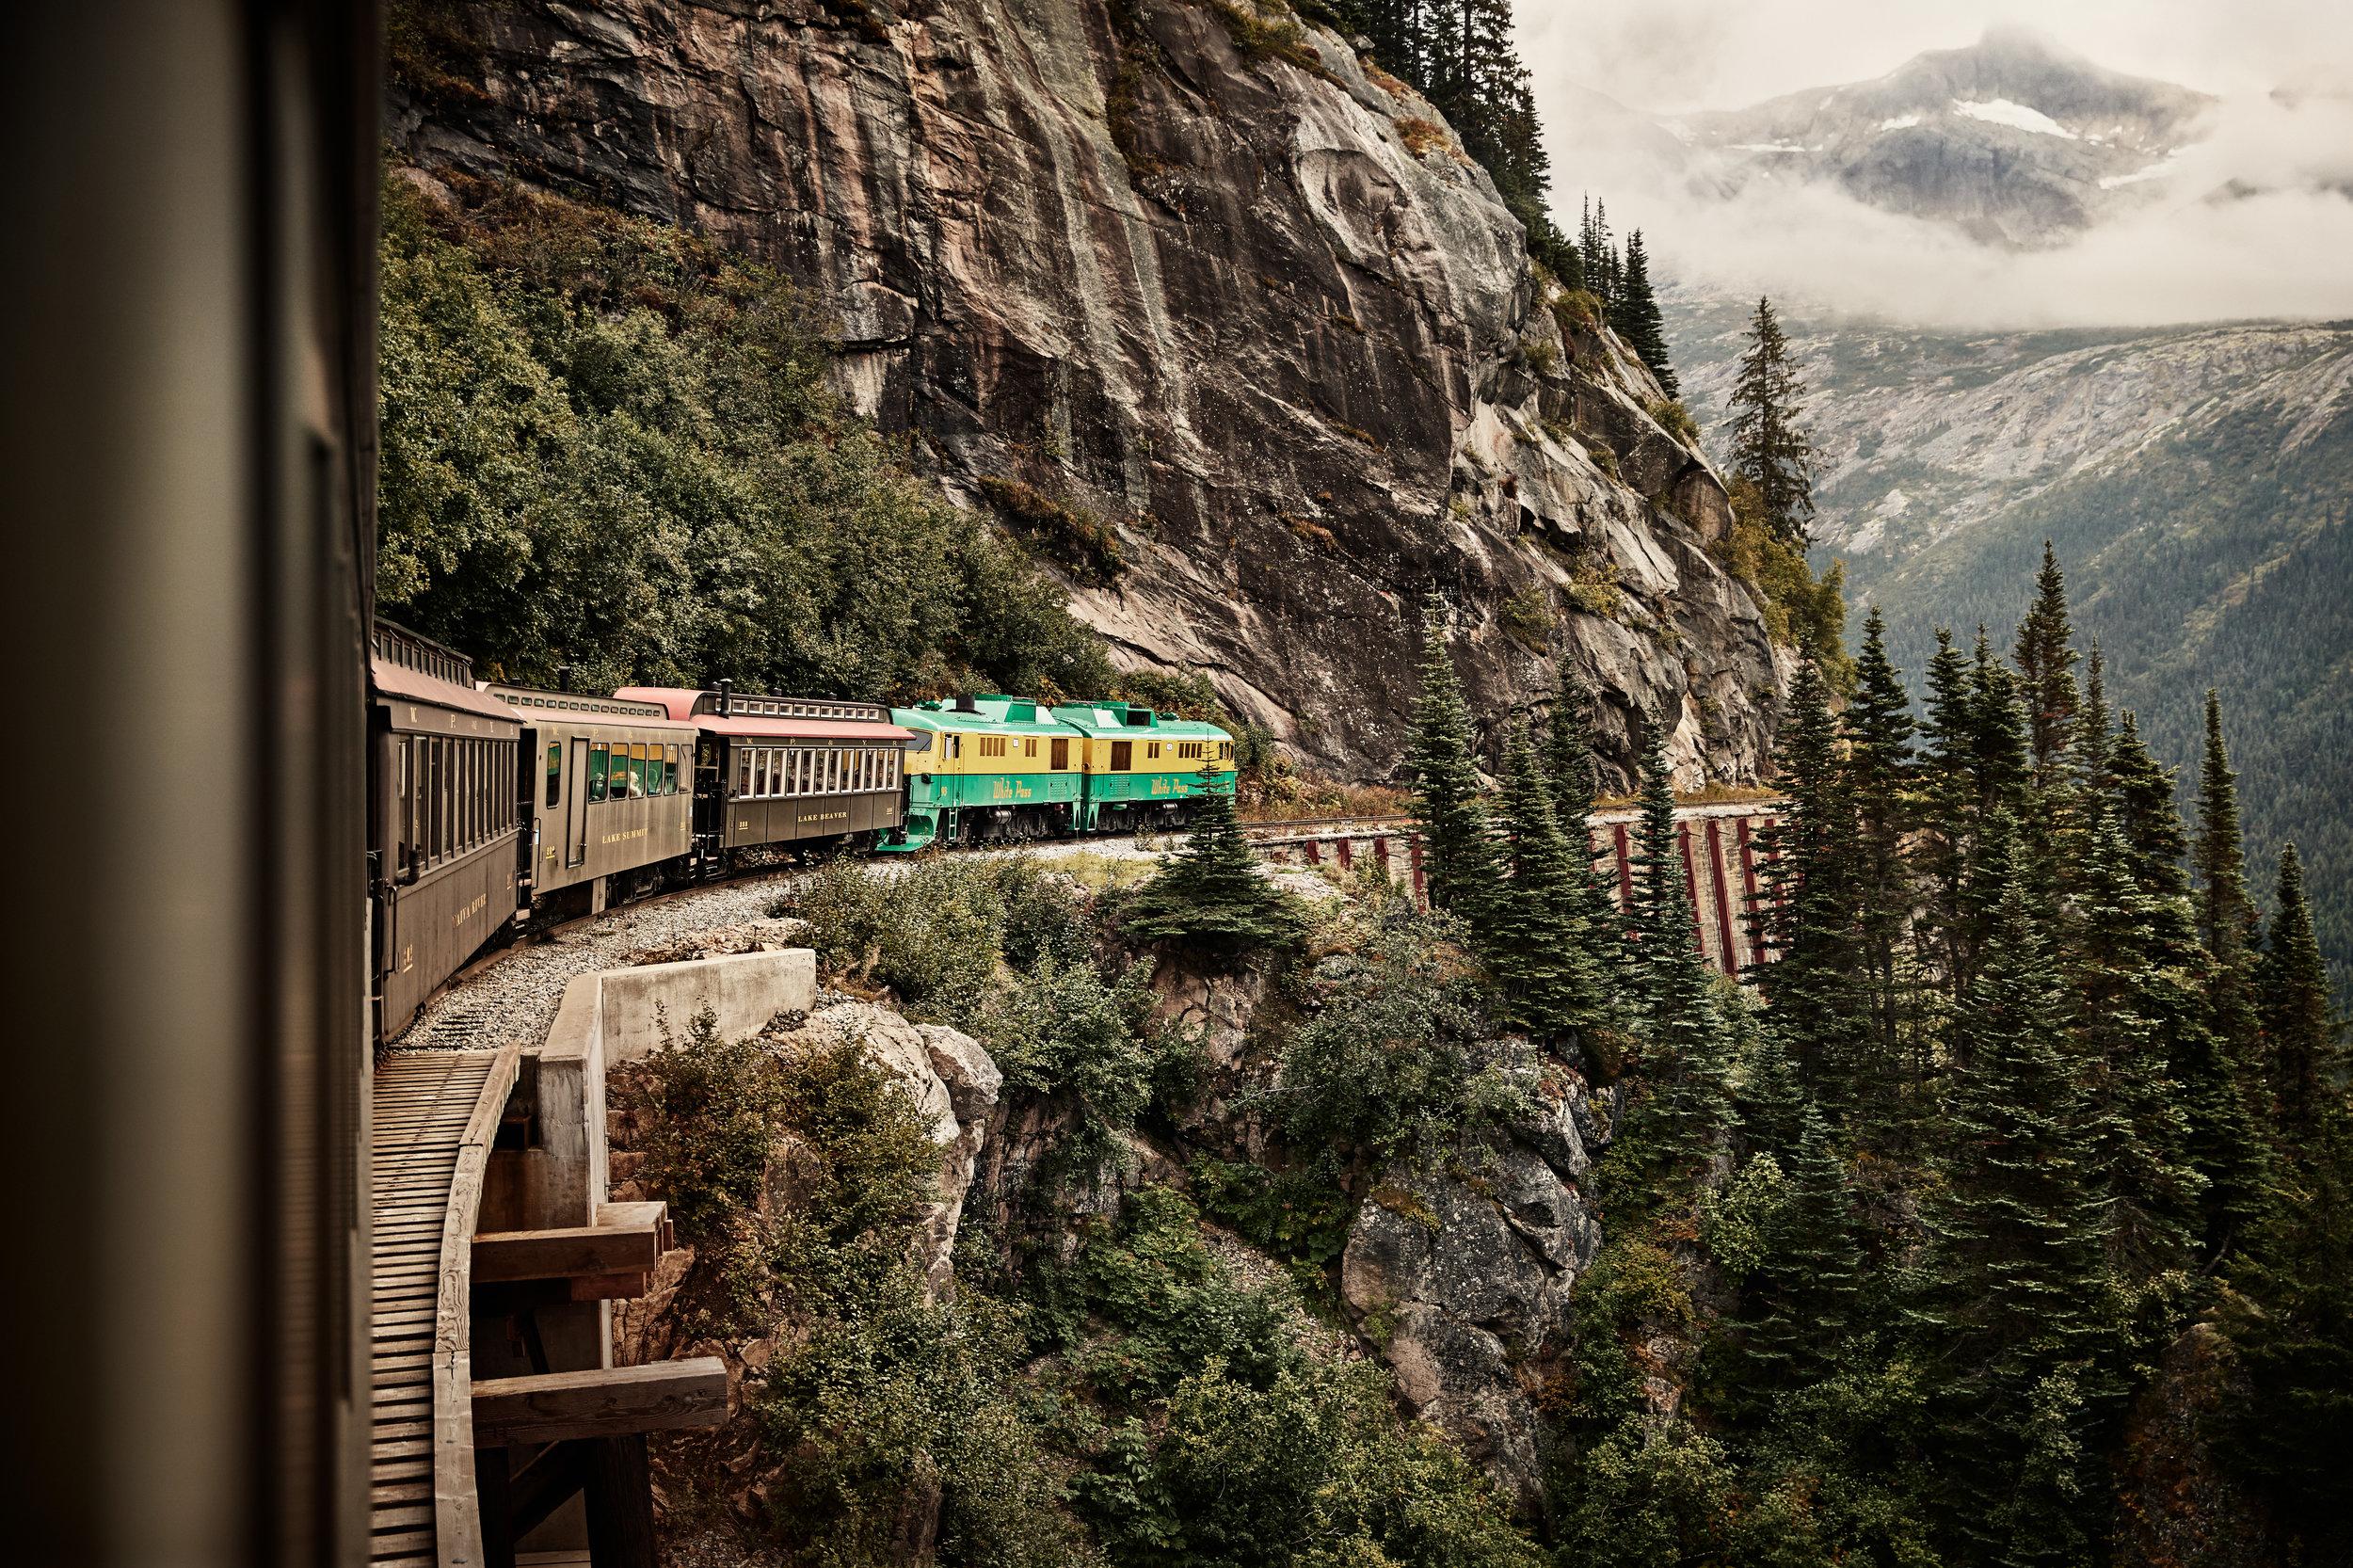 RU_2016_0904_MK_White_Pass_Railway_30099_CvD_RGB.jpg